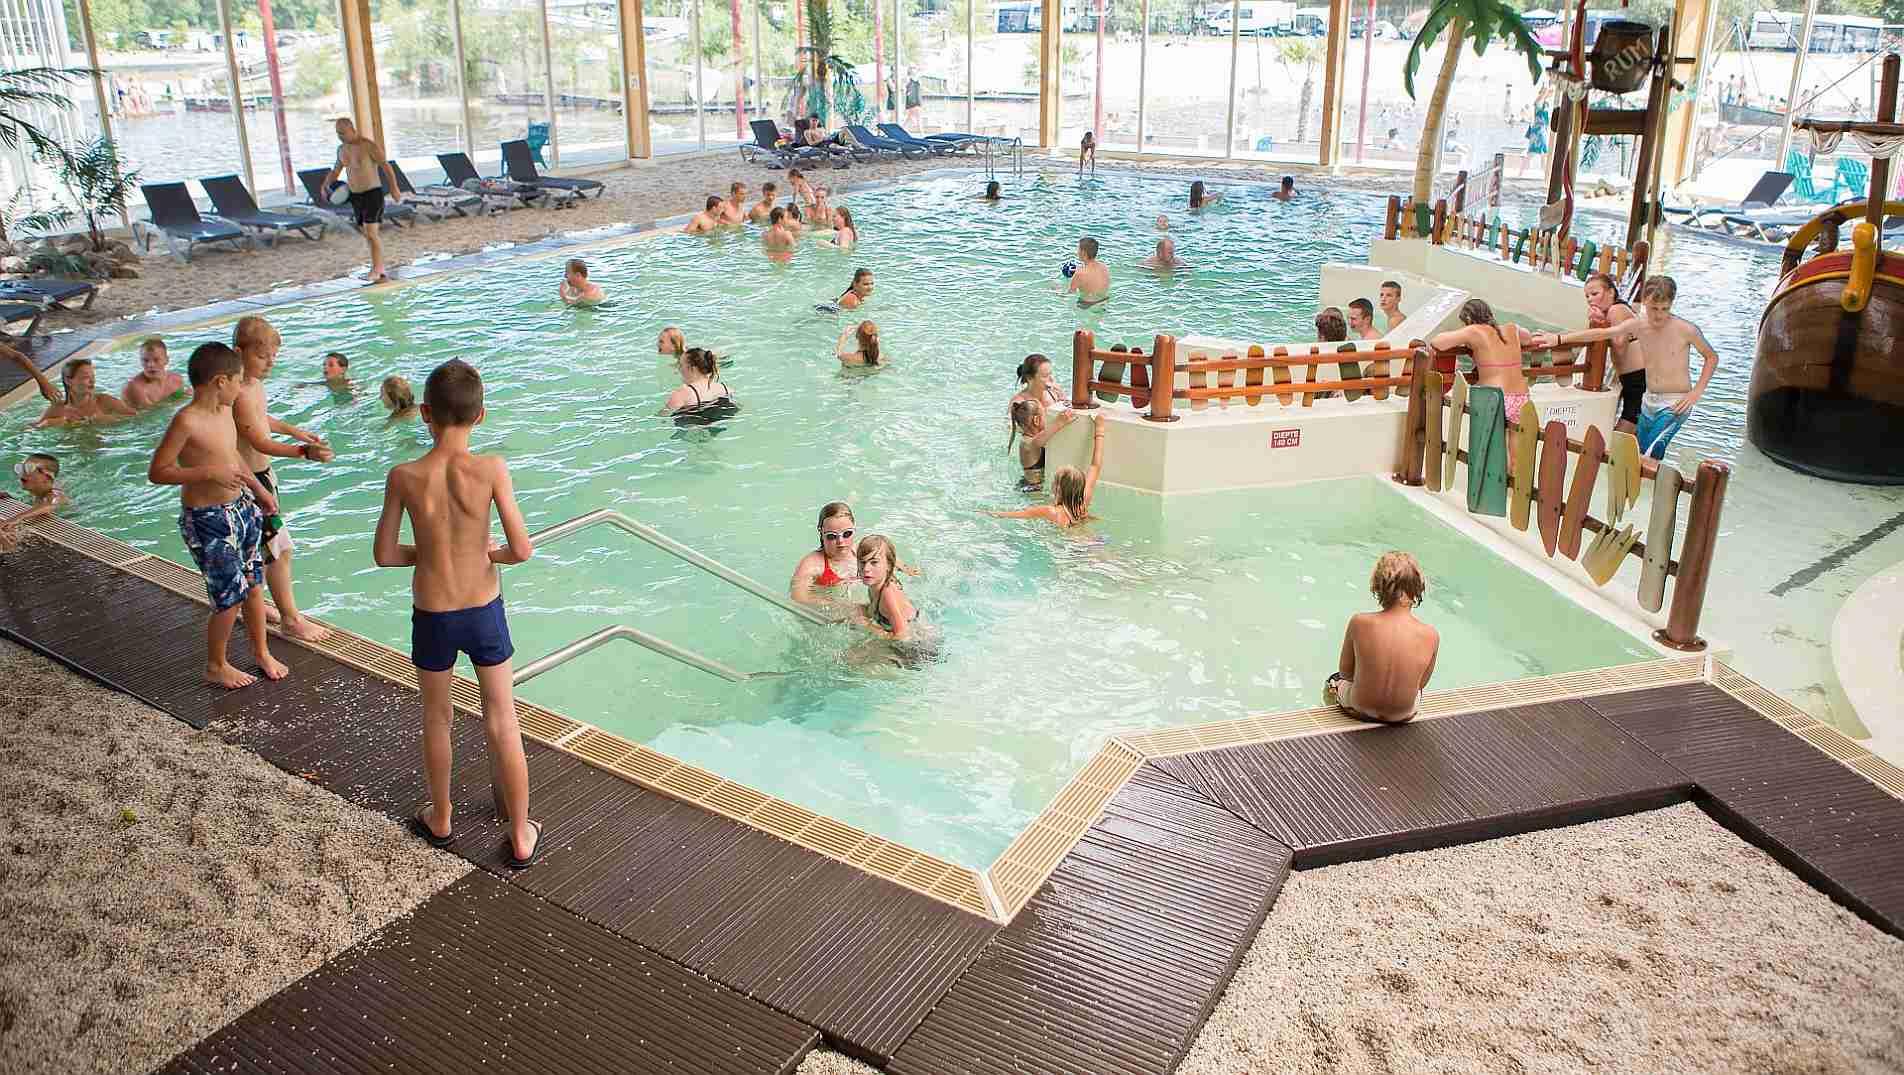 Herbstferien auf 5-Sterne Ferienpark in Hardenberg - Herbstferien im Ferienpark het Stoetenslagh